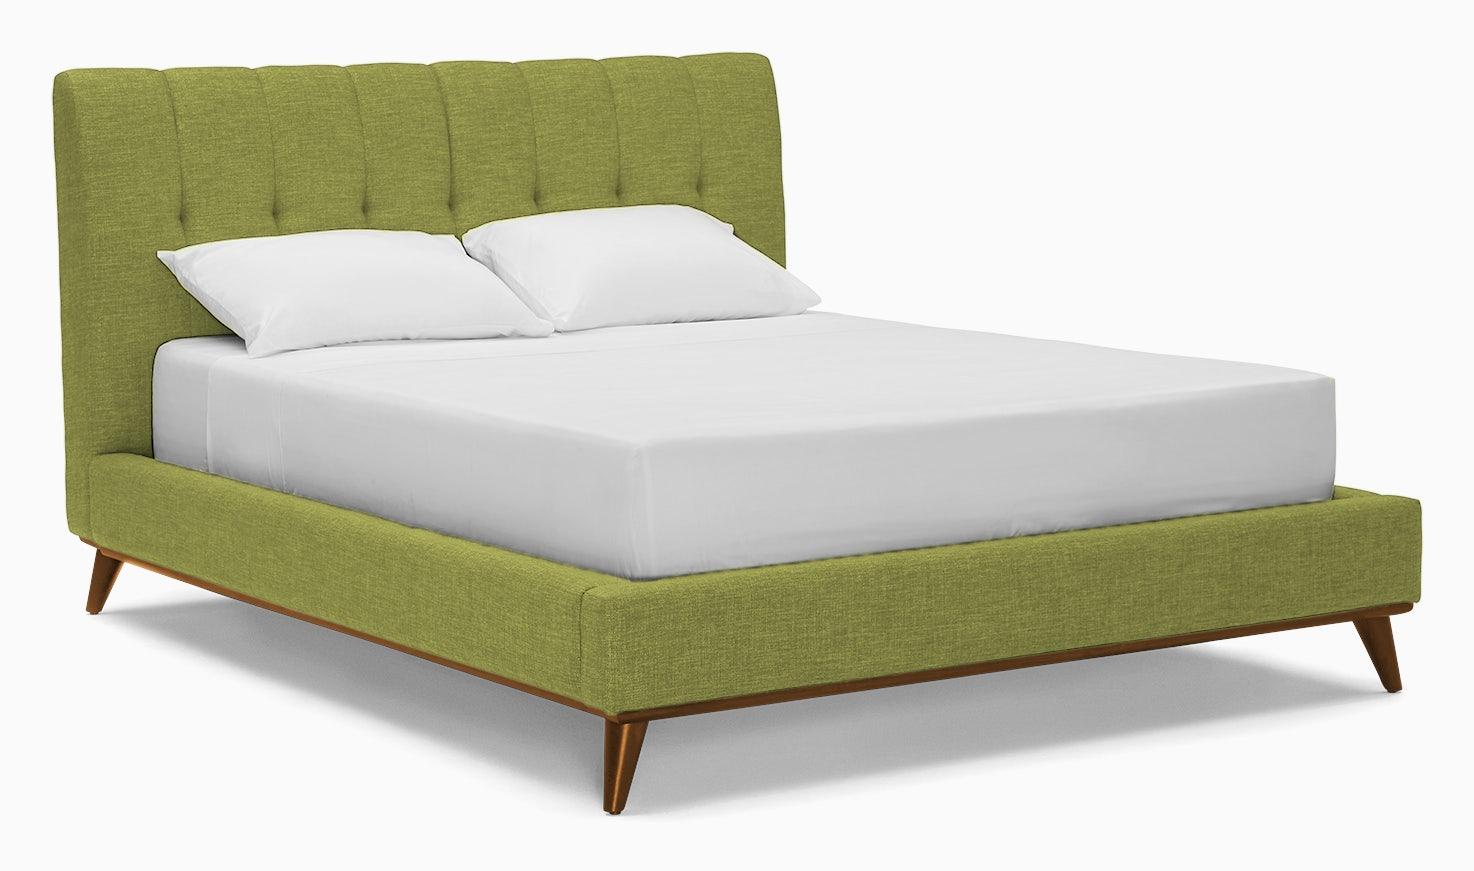 hughes bed notion appletini